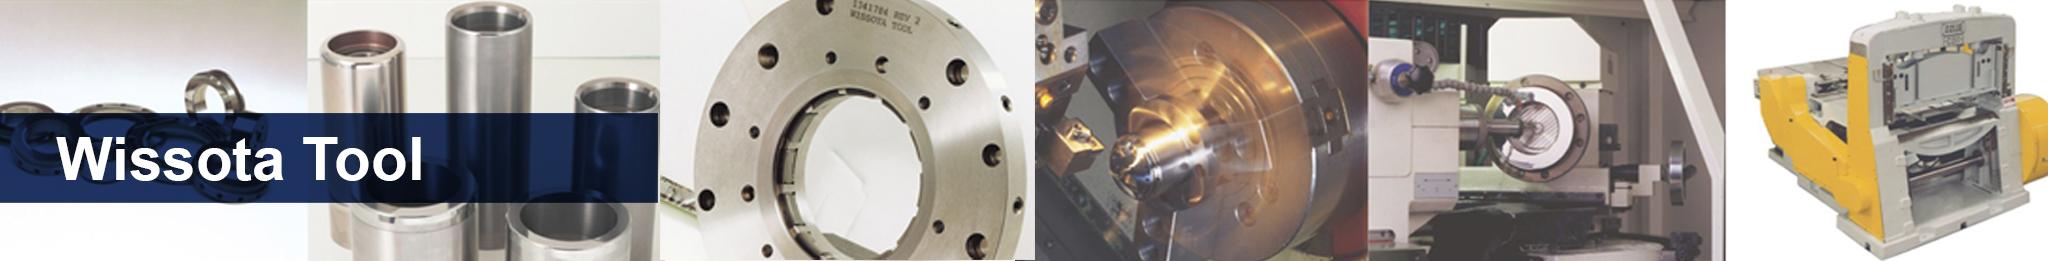 machine--divider-headers--wissota-v2